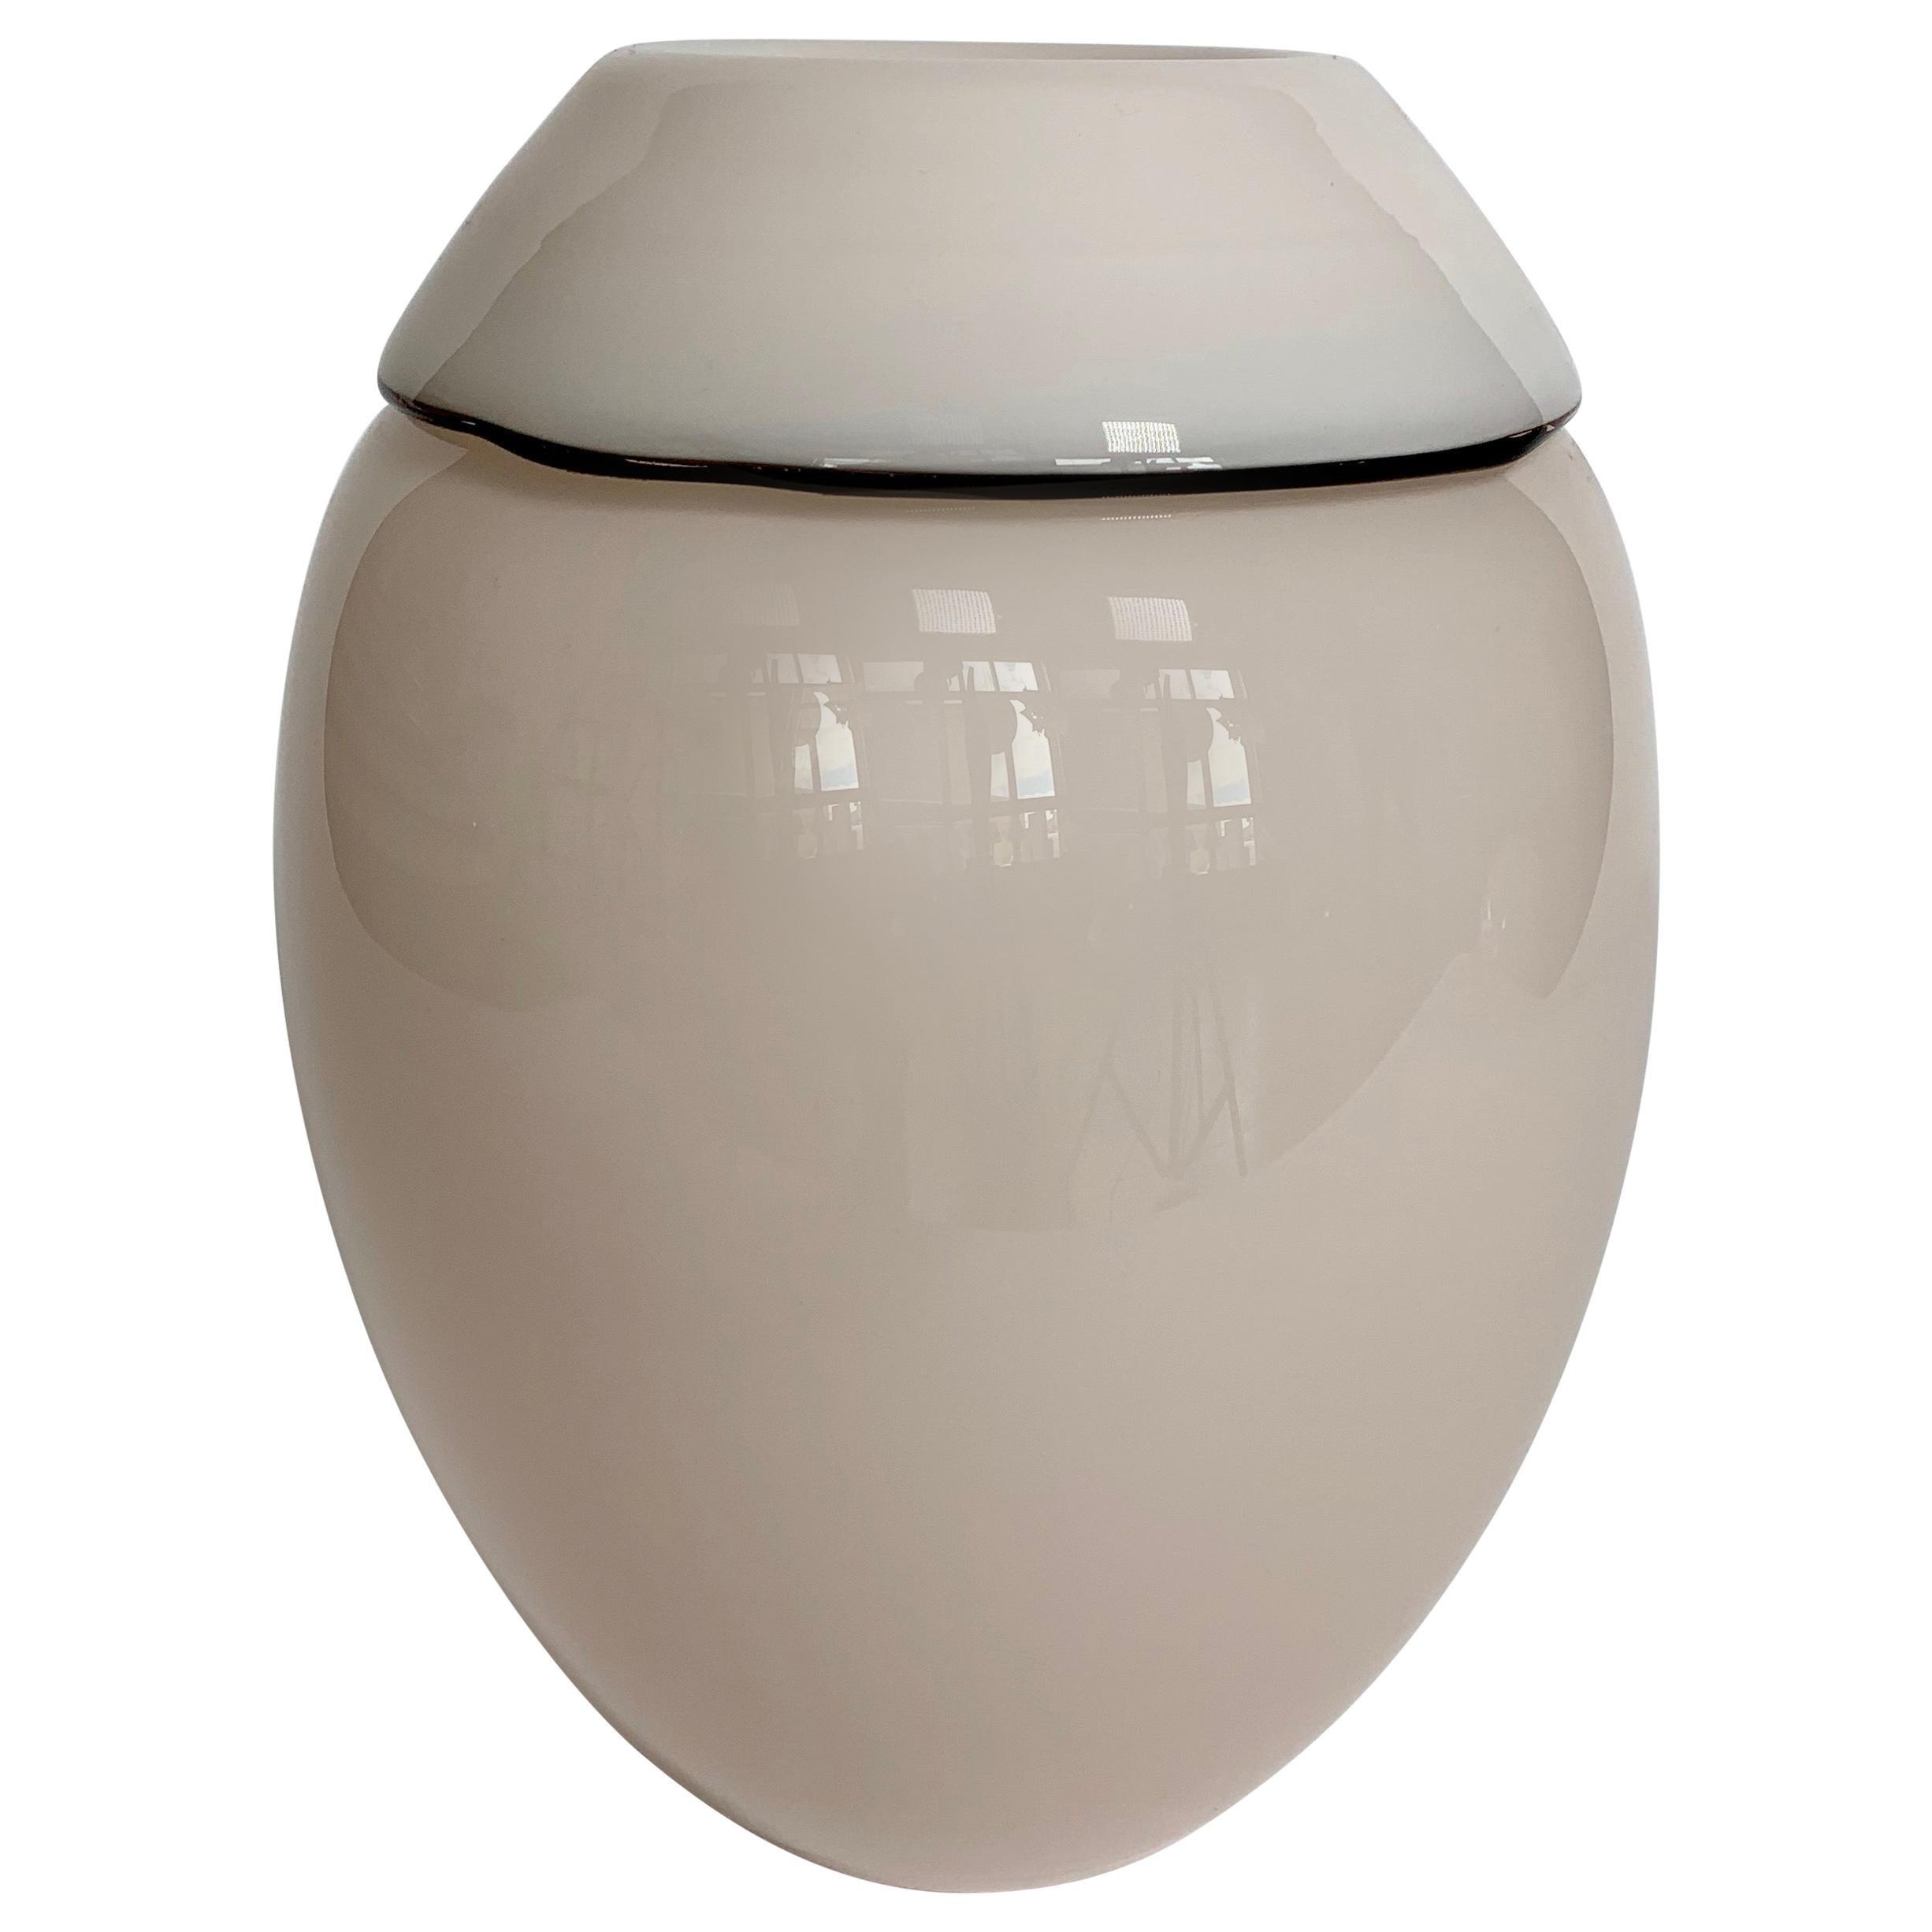 Italian Murano Glass Vase Burana Model by Lino Tagliapietra F3 International